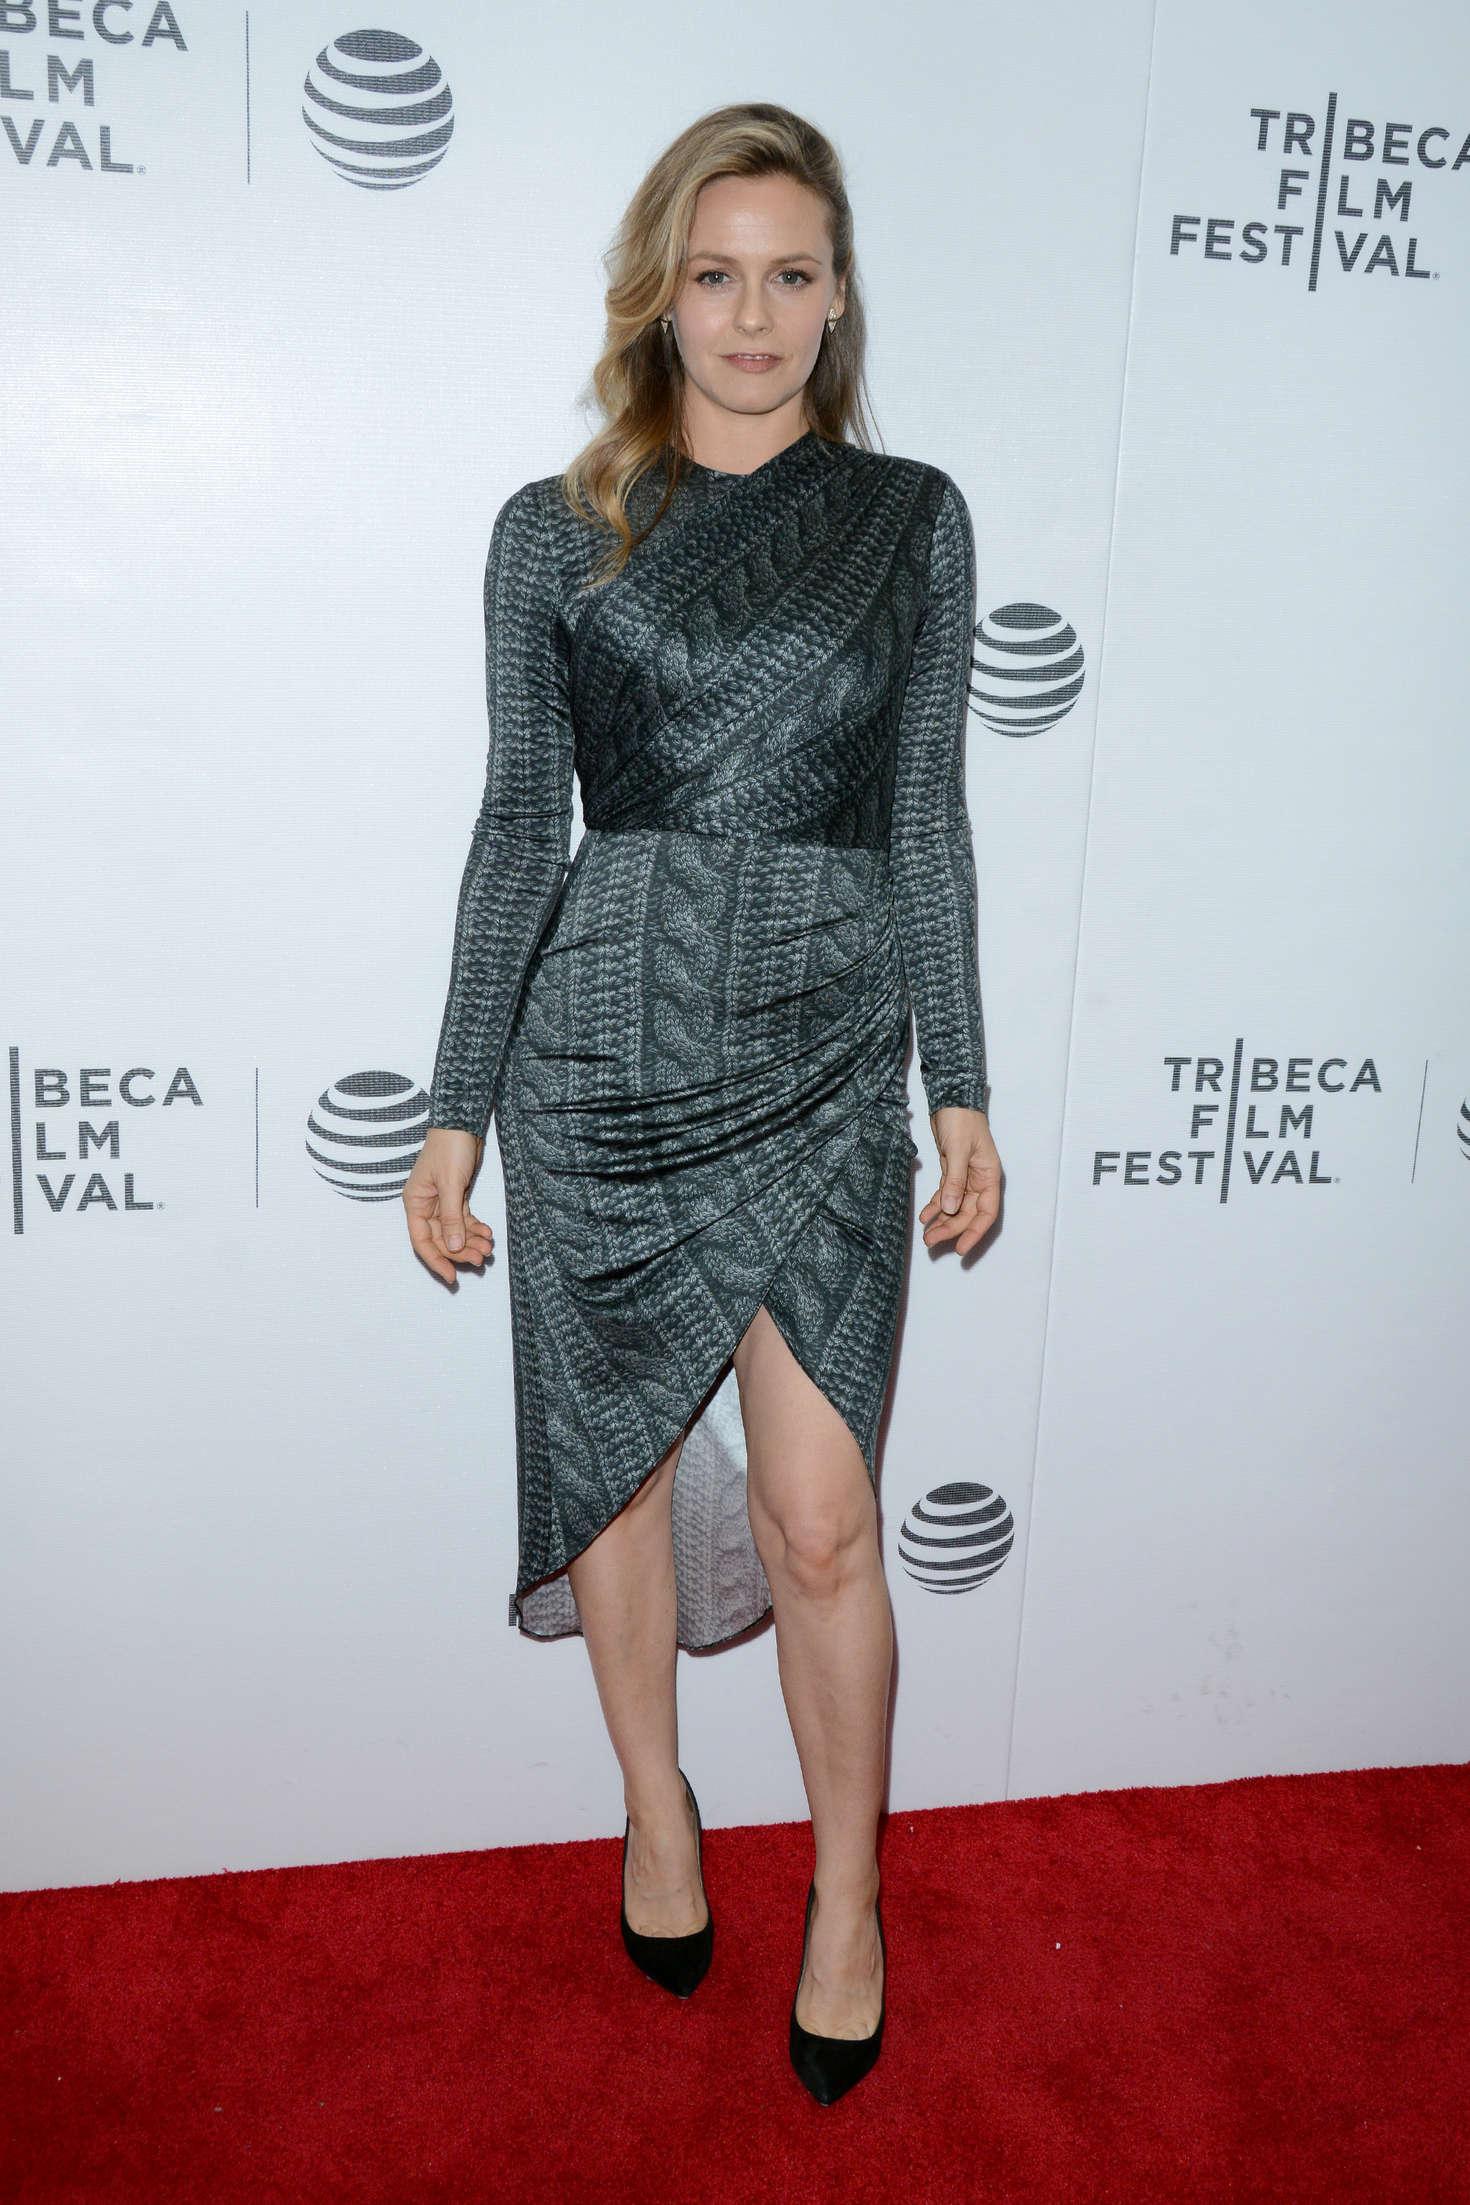 Alicia Silverstone King Cobra Premiere At 2016 Tribeca Film